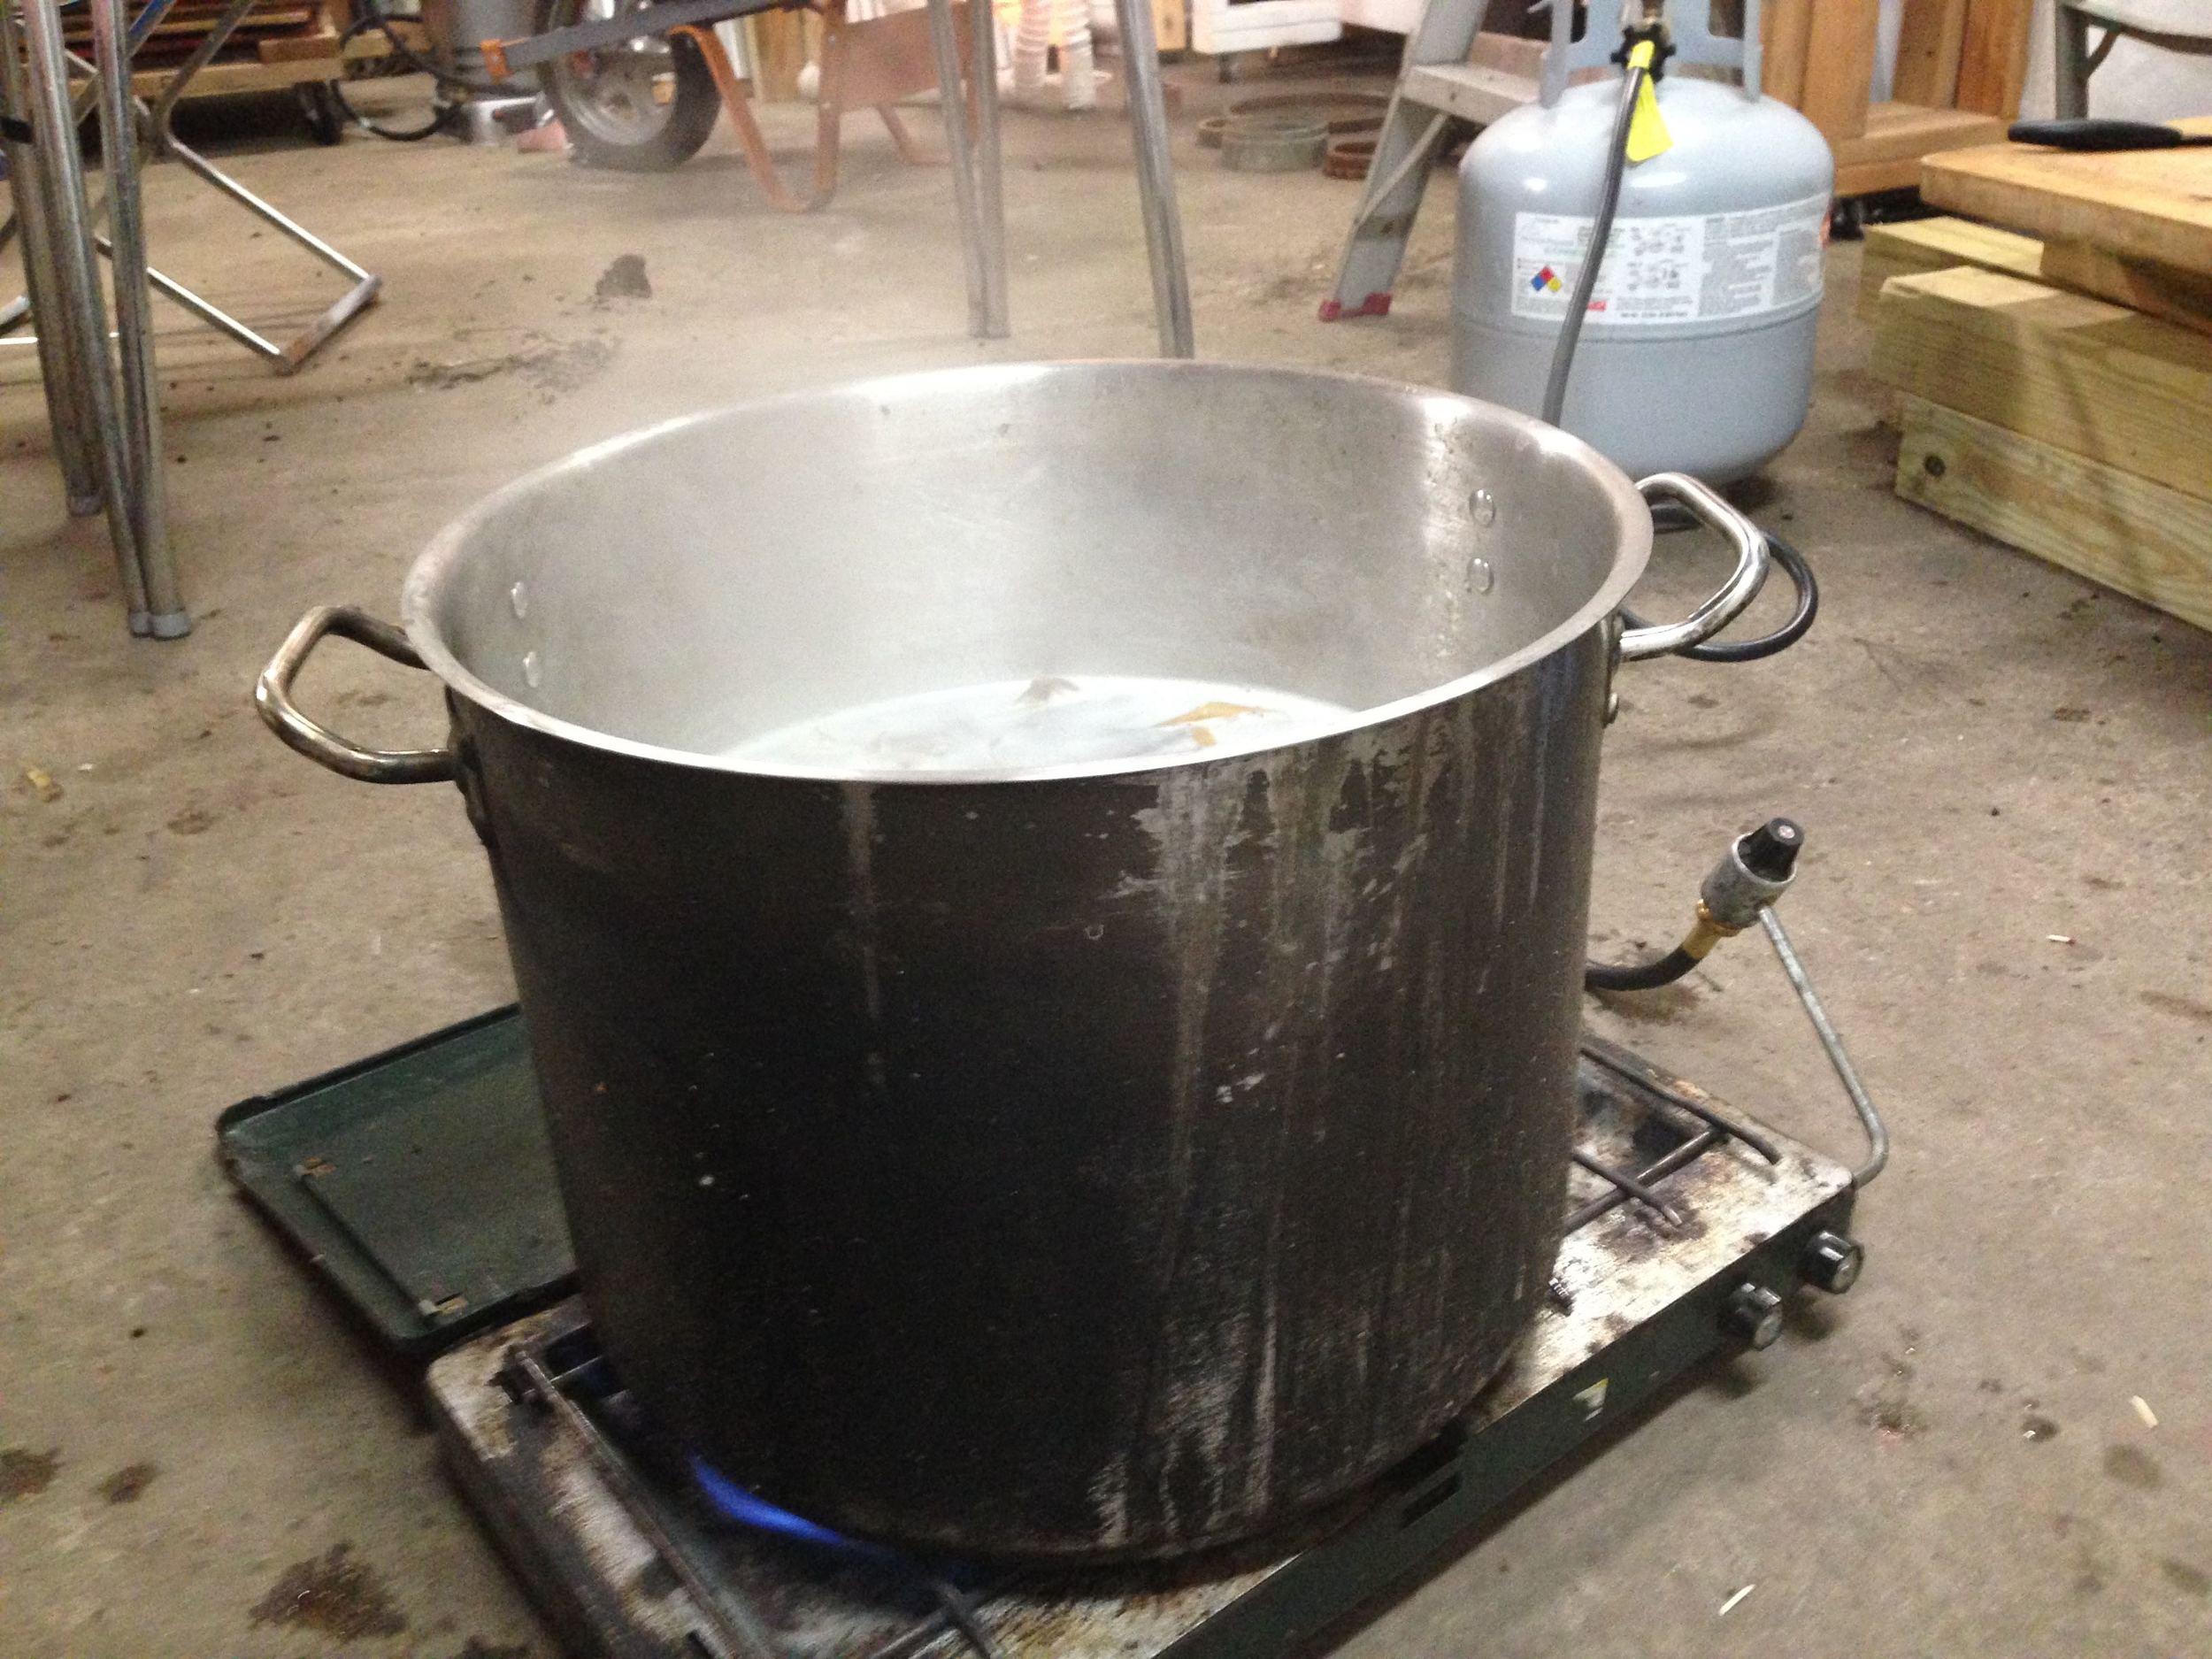 6. cooking_of_honeysuckle_fibers.jpg